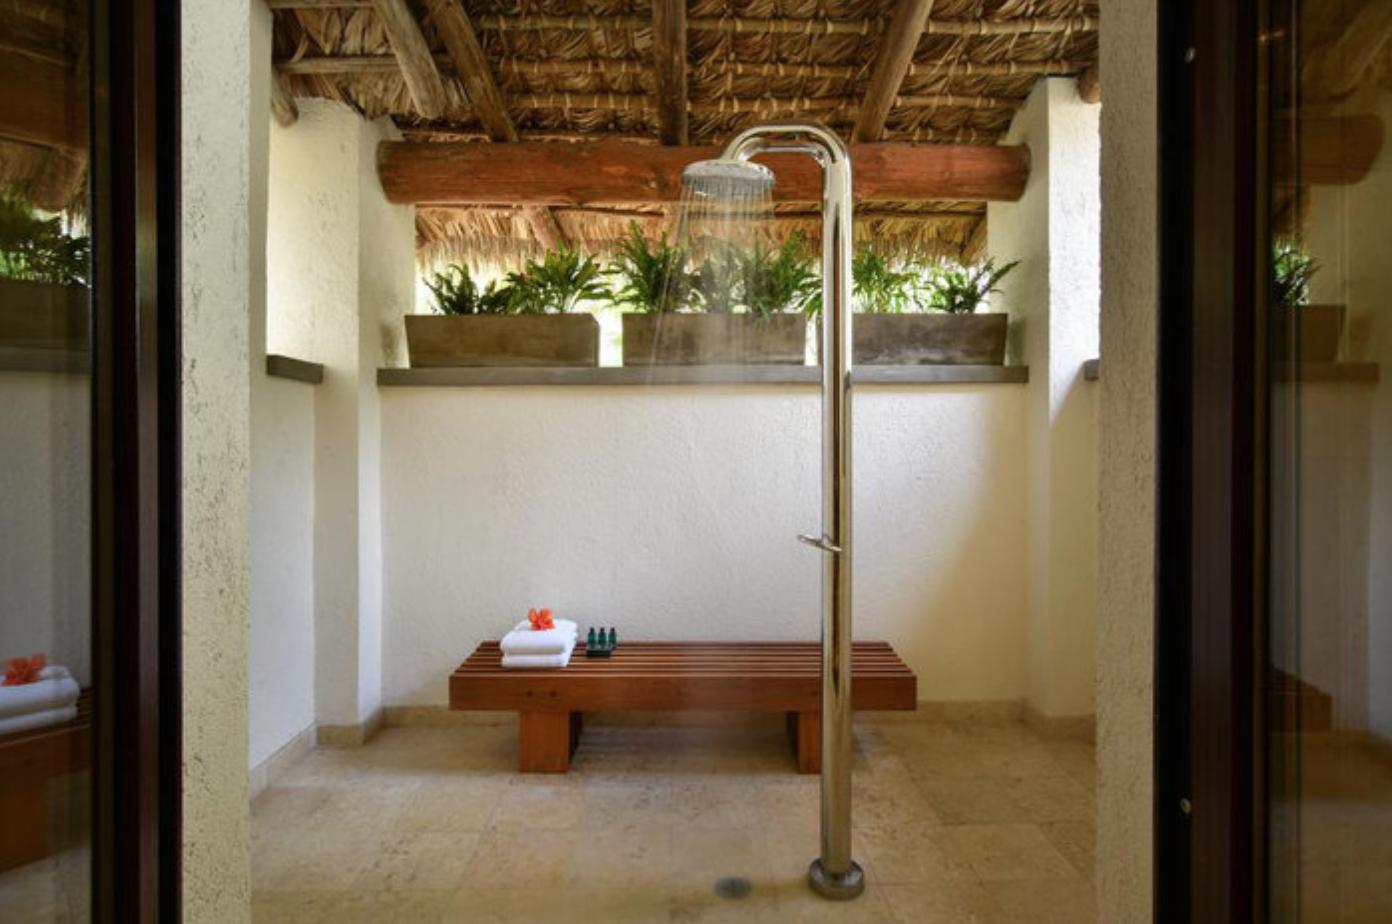 nevis shower.png